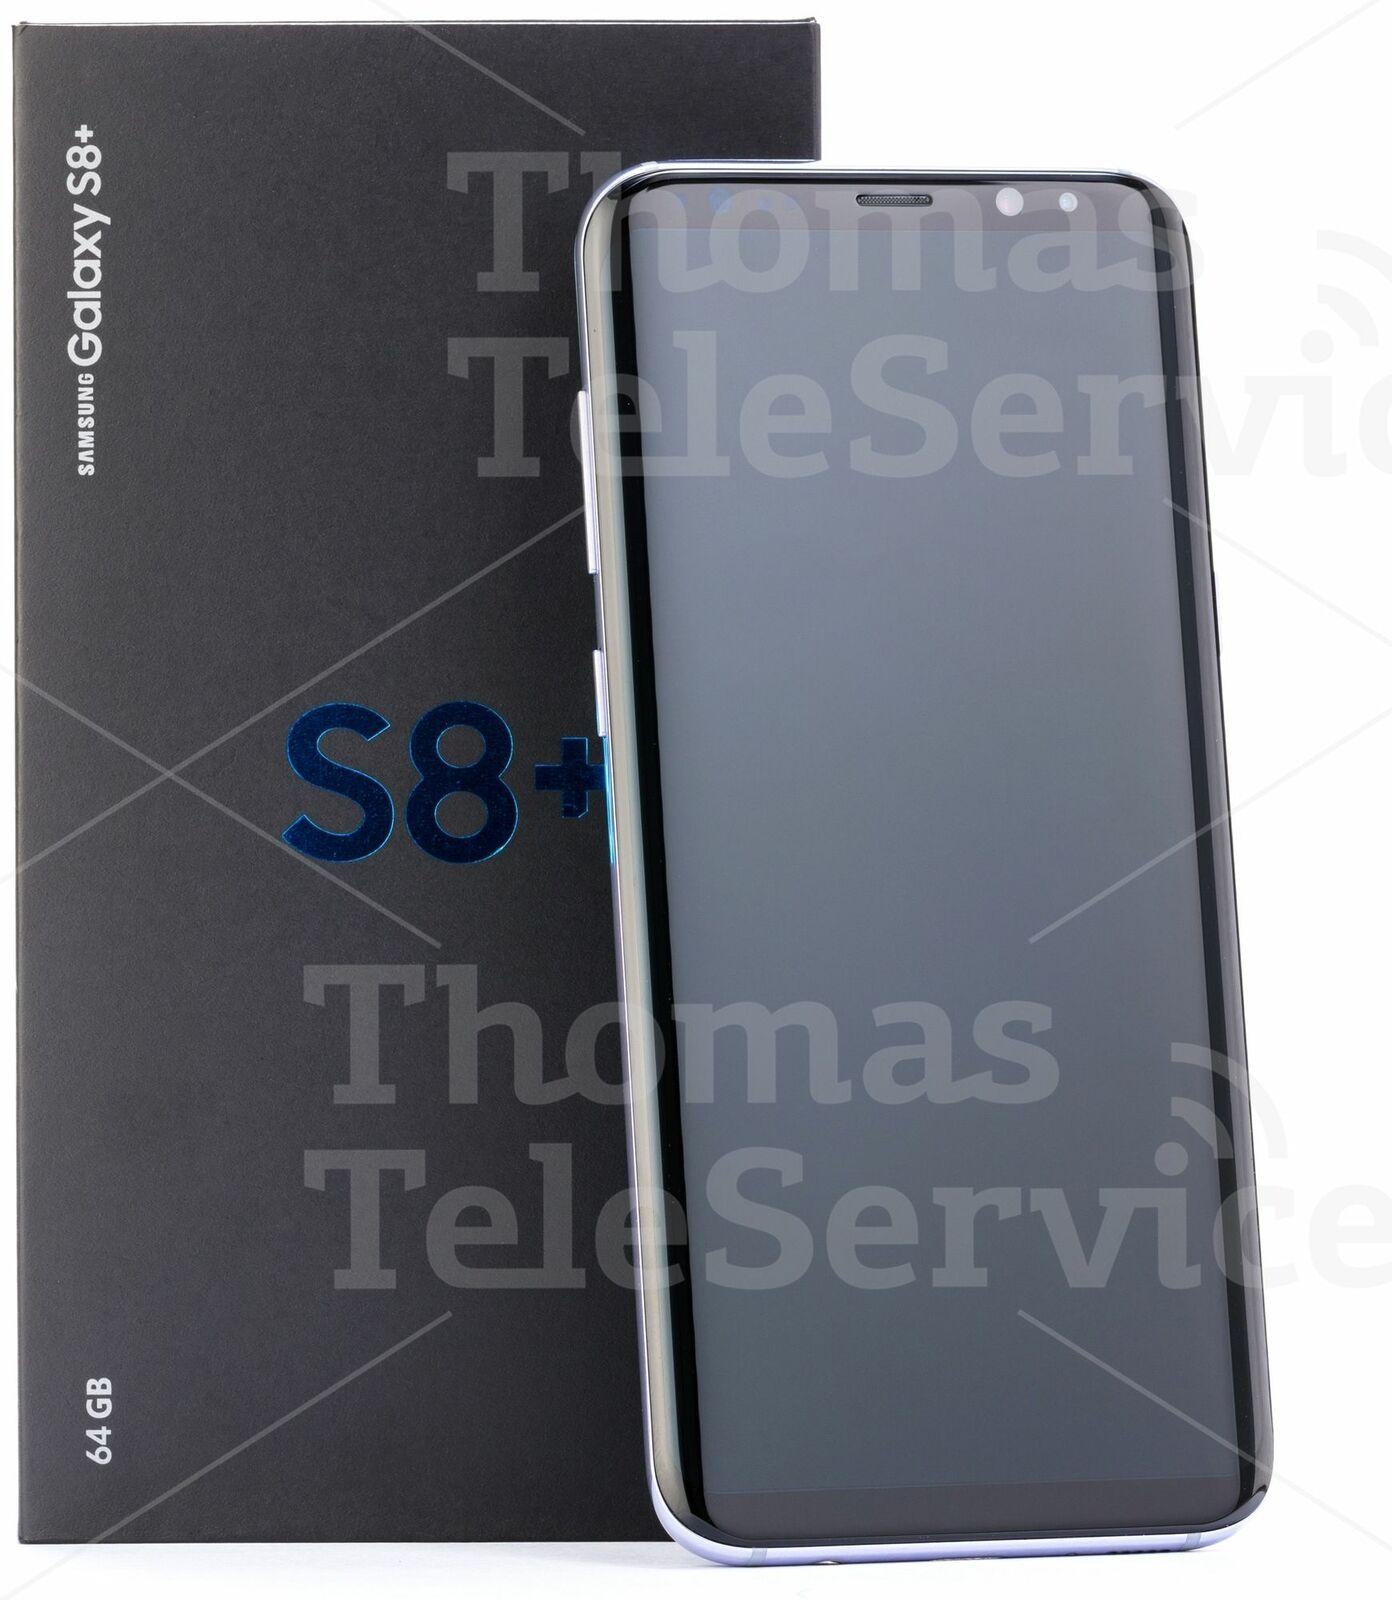 Samsung Galaxy S8 Plus G955f Black Schwarz Smartphone Handy Android HD Neu OVP